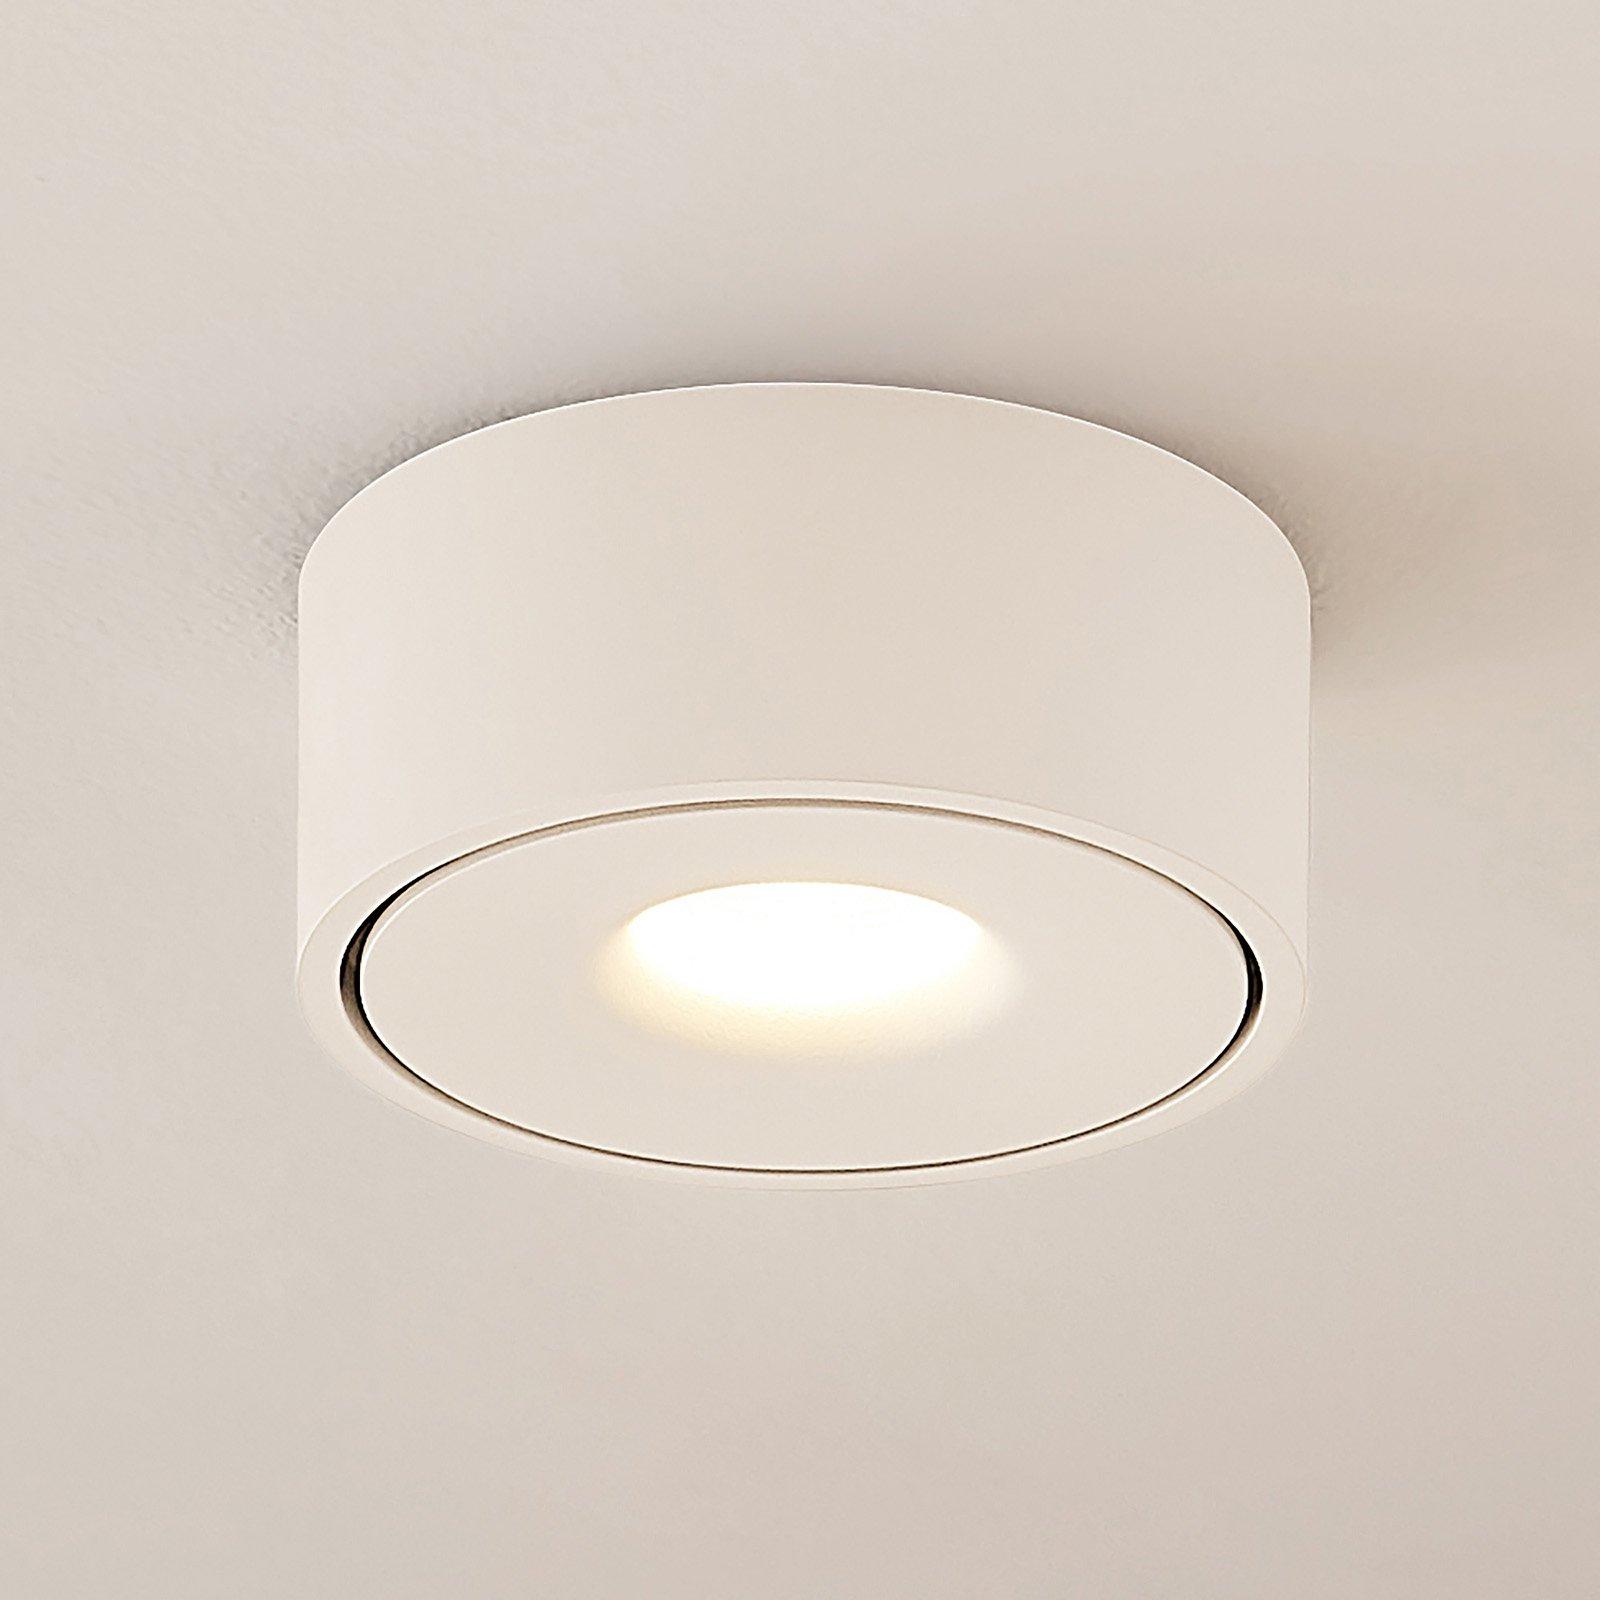 Arcchio Ranka LED-taklampe, hvit